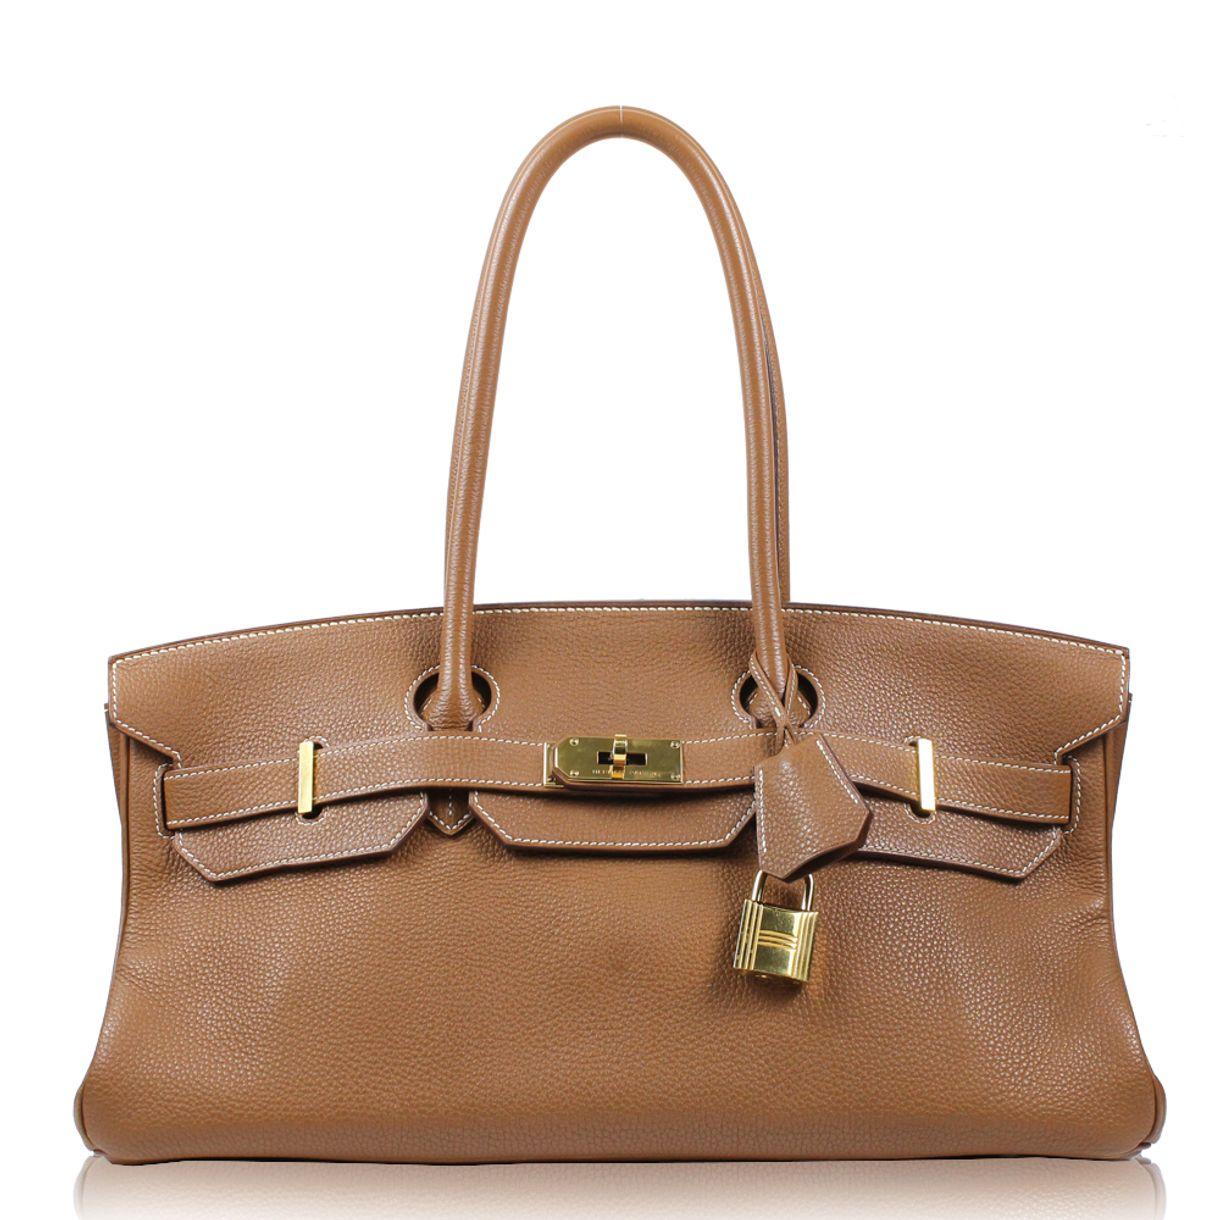 f0c2f9a84d548 Bolsa Hermès Birkin Shoulder Clemence Caramelo